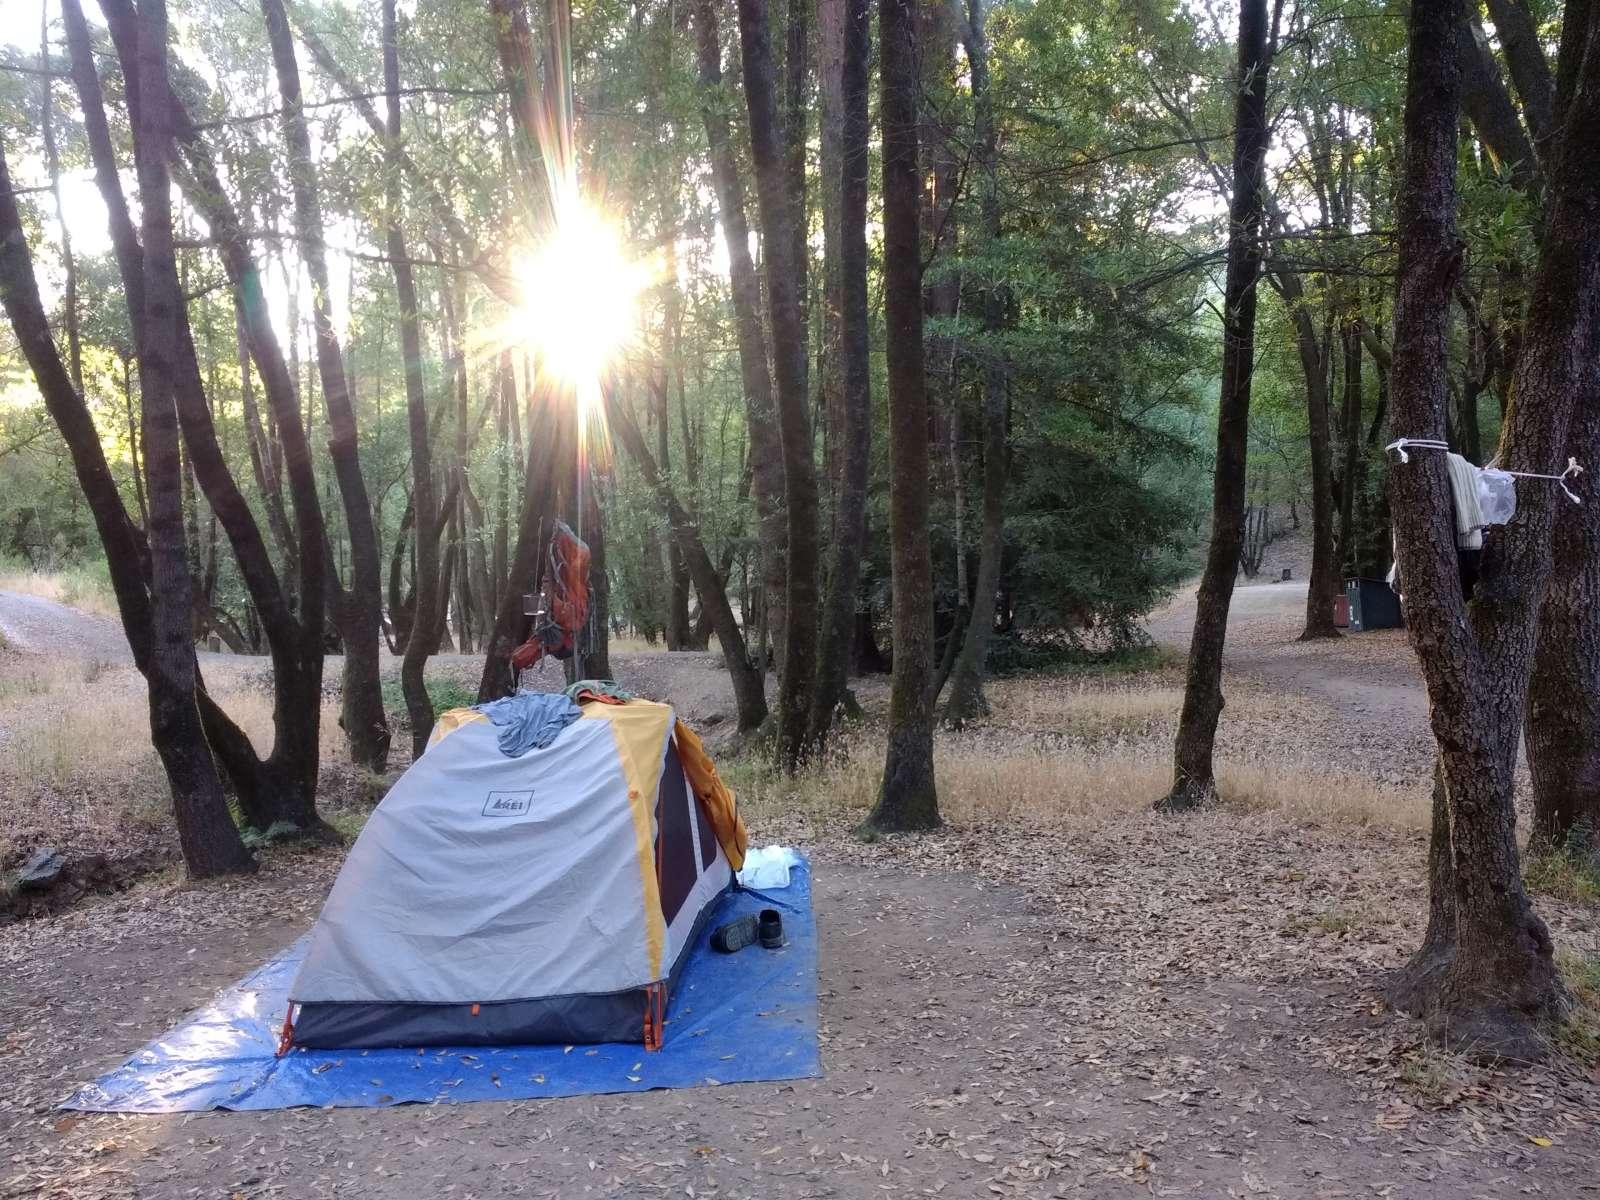 China Camp State Park Camping